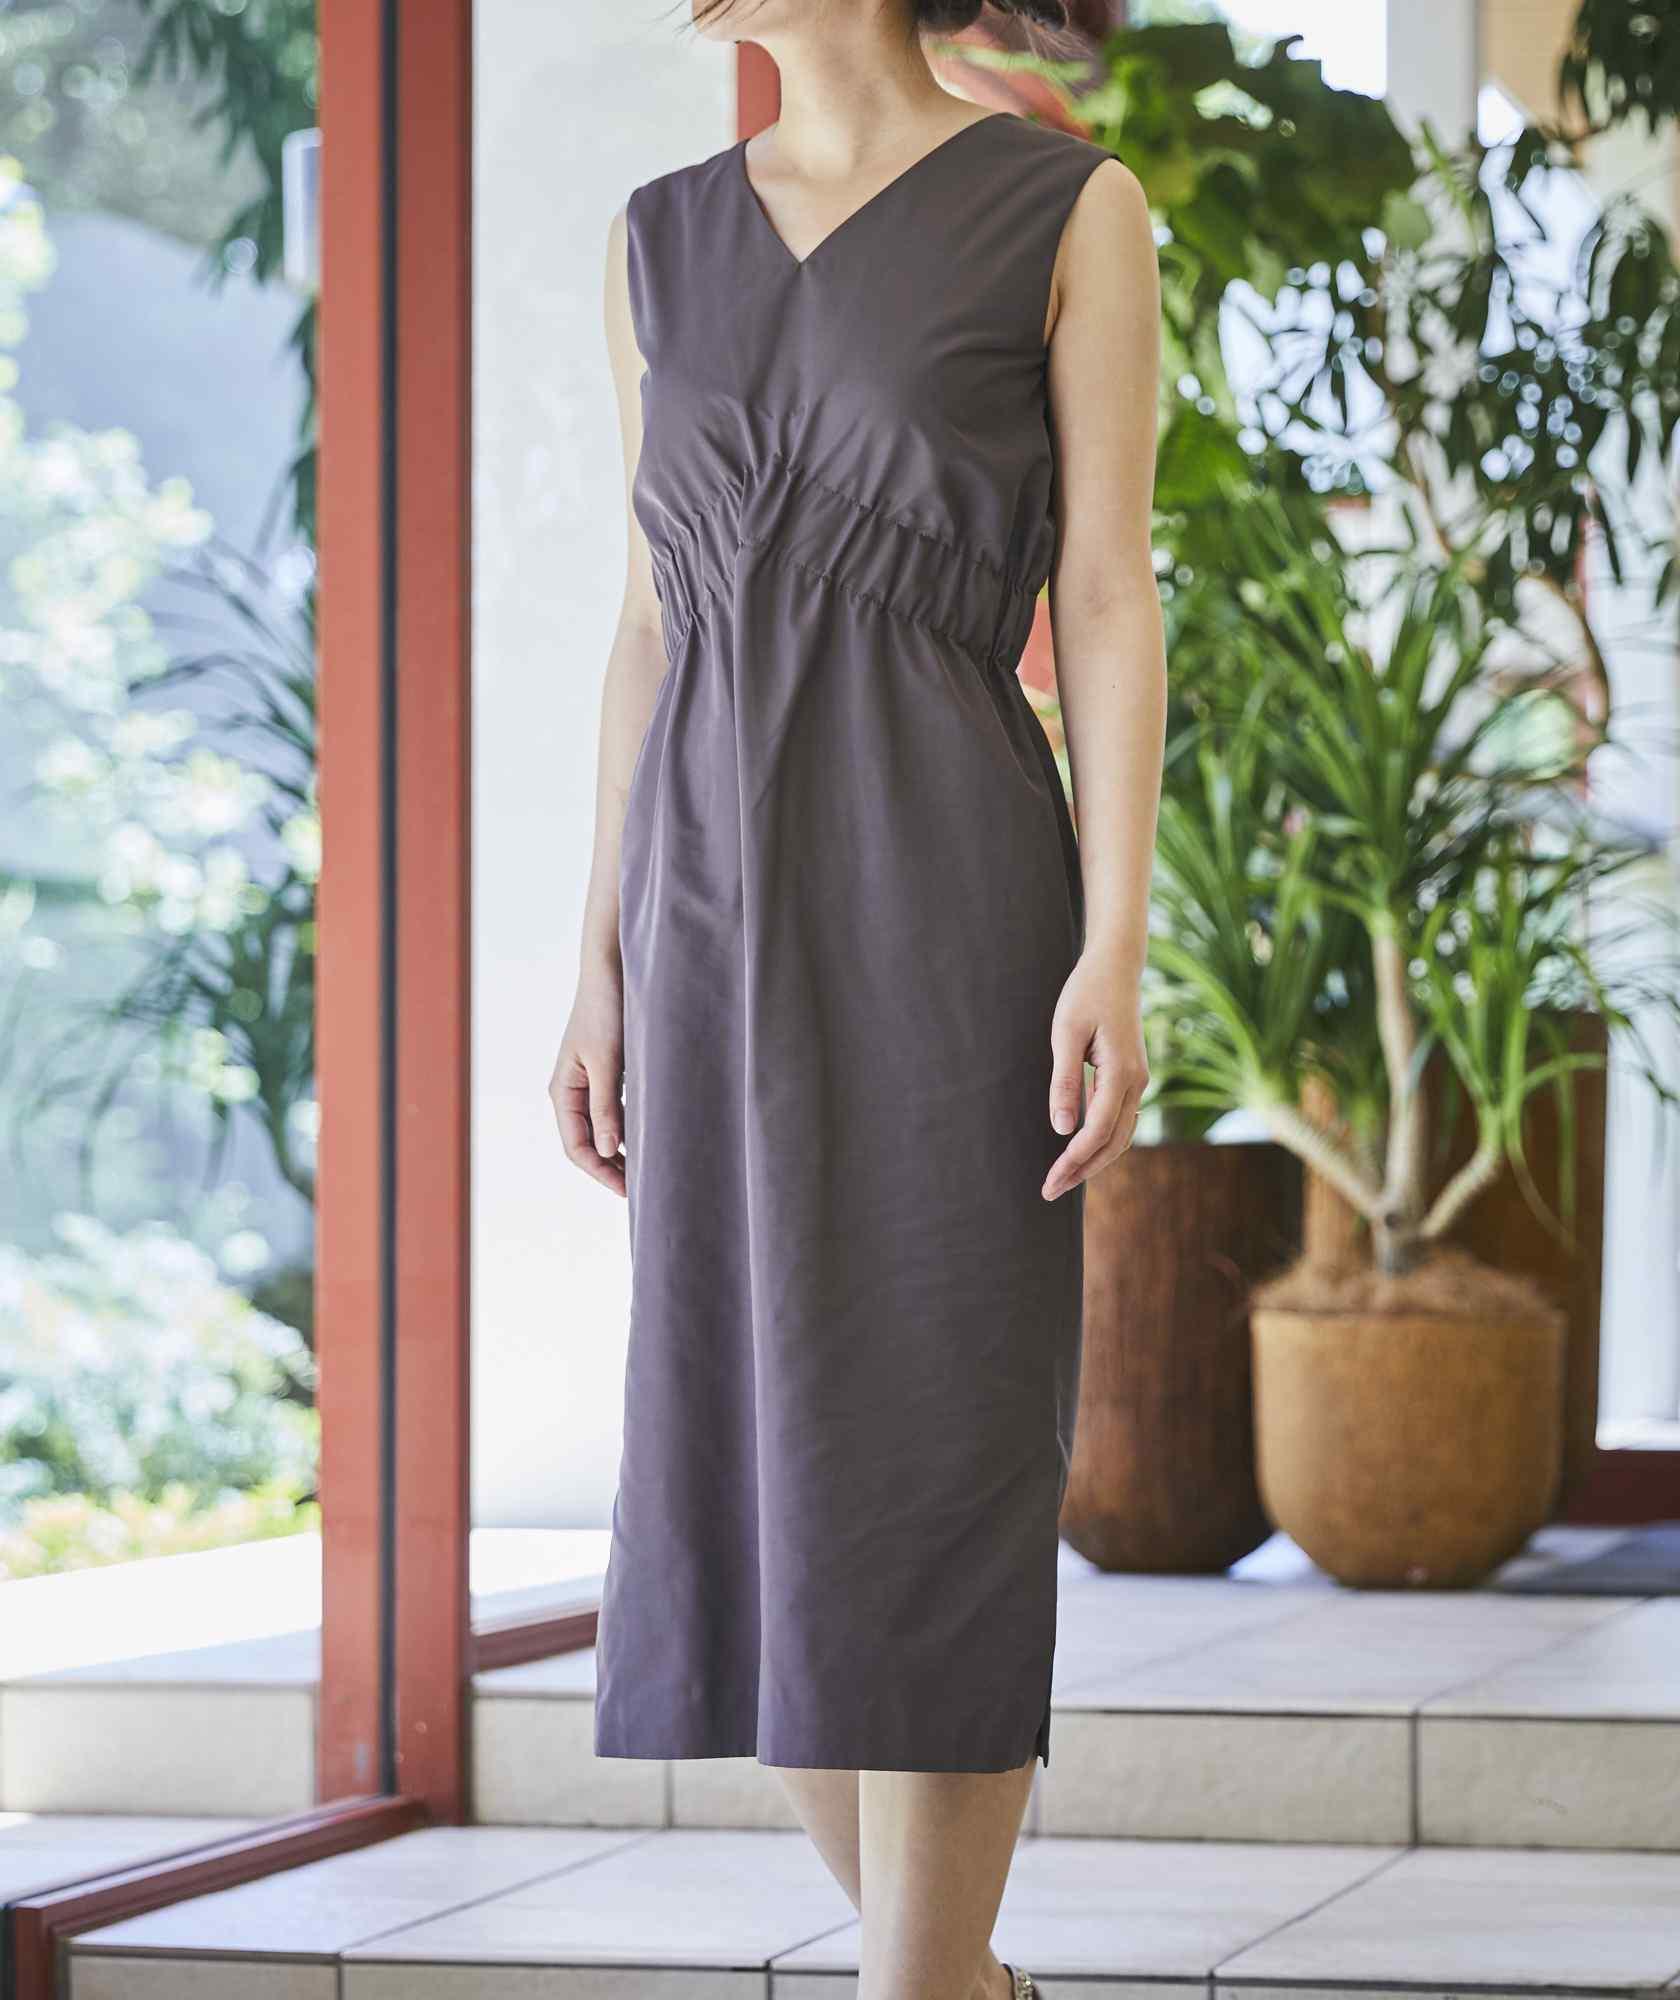 VネックシャーリングOGタイトミディアムドレス-グレー-S